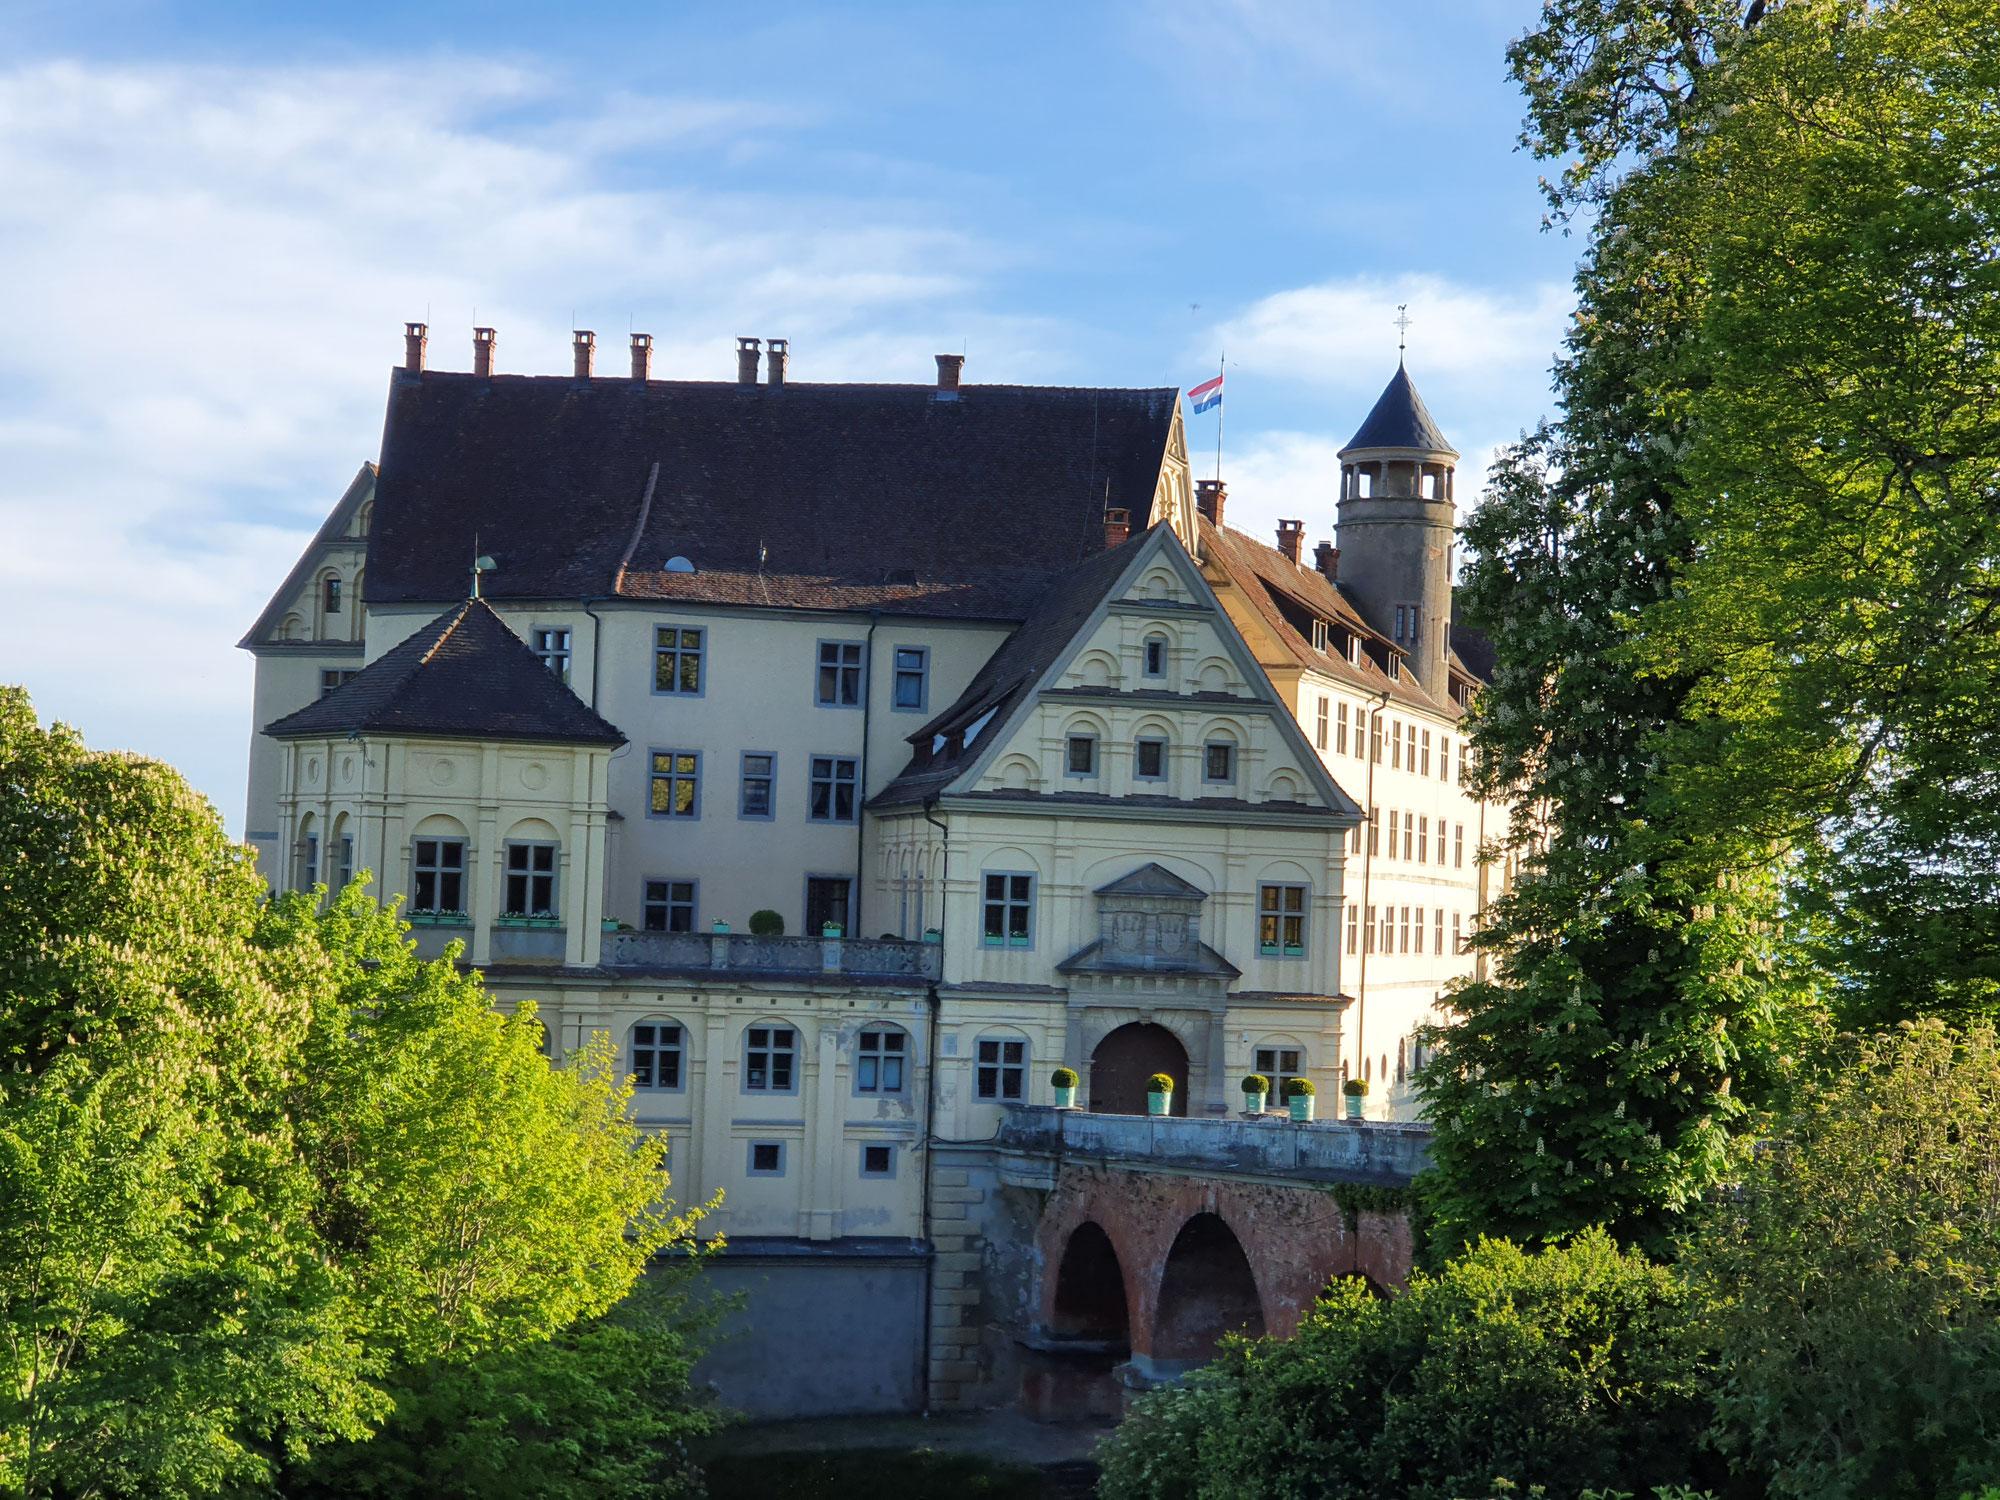 Luftkurort & Schloss Heiligenberg